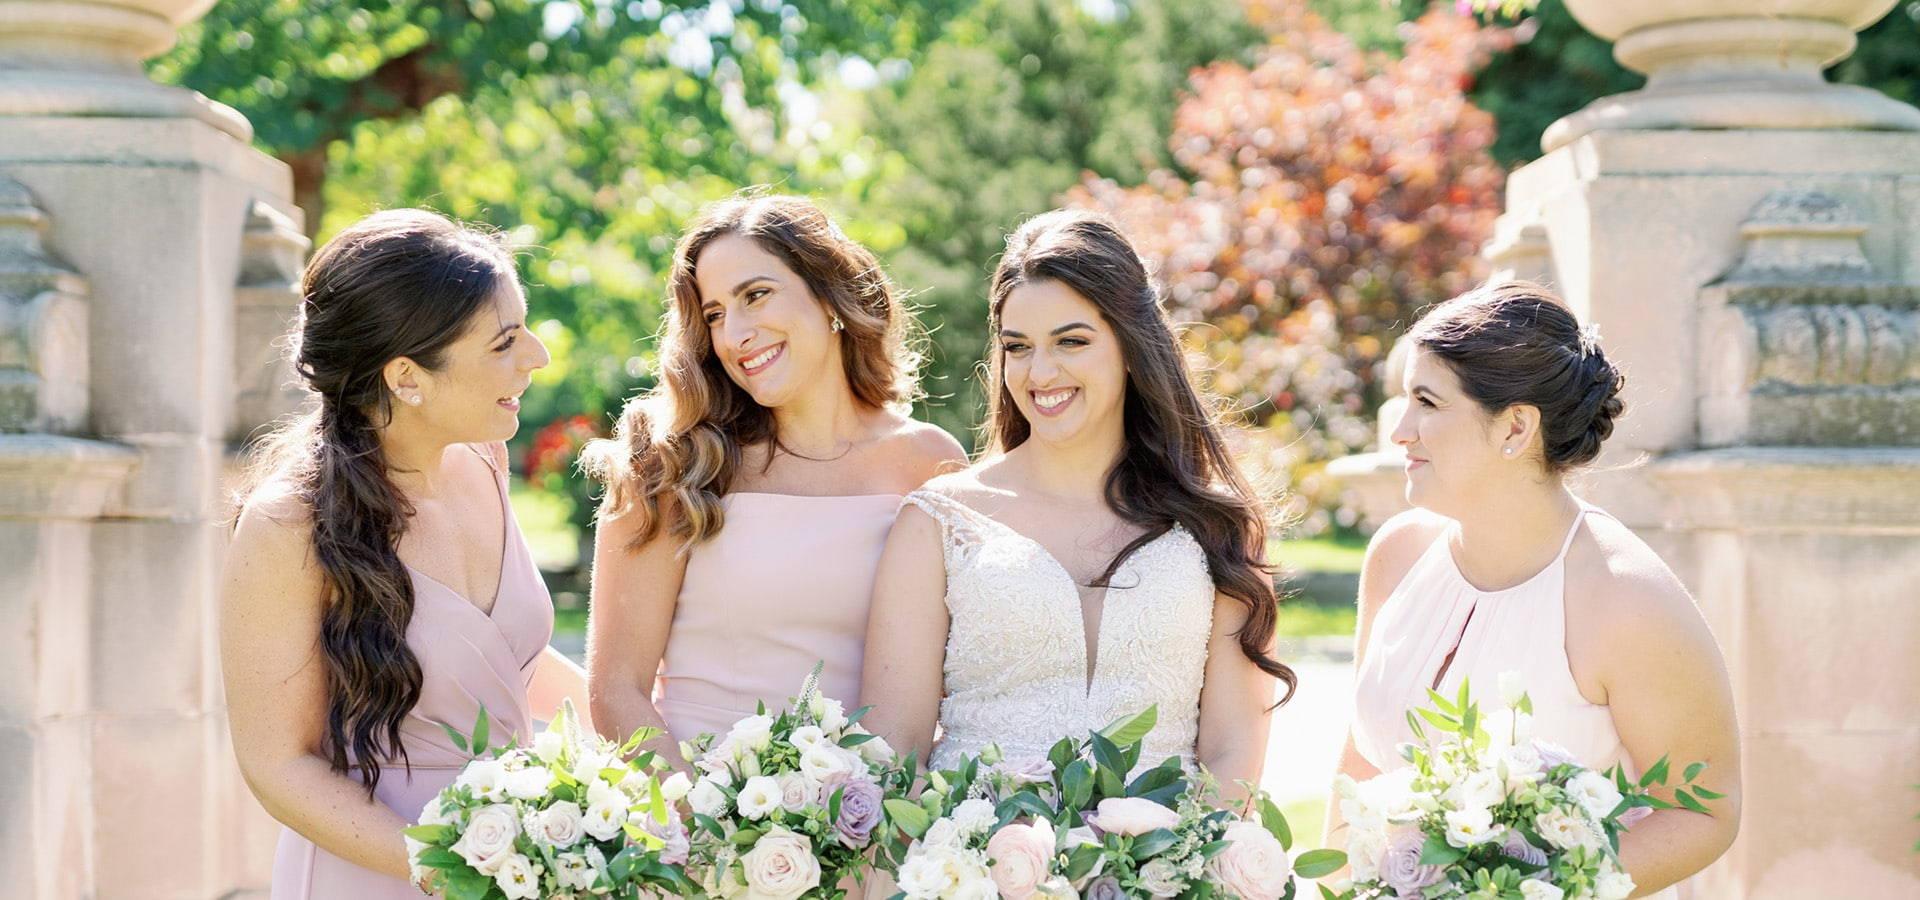 Hero image for Shari and Antonio's Luxe Wedding at York Mills Gallery